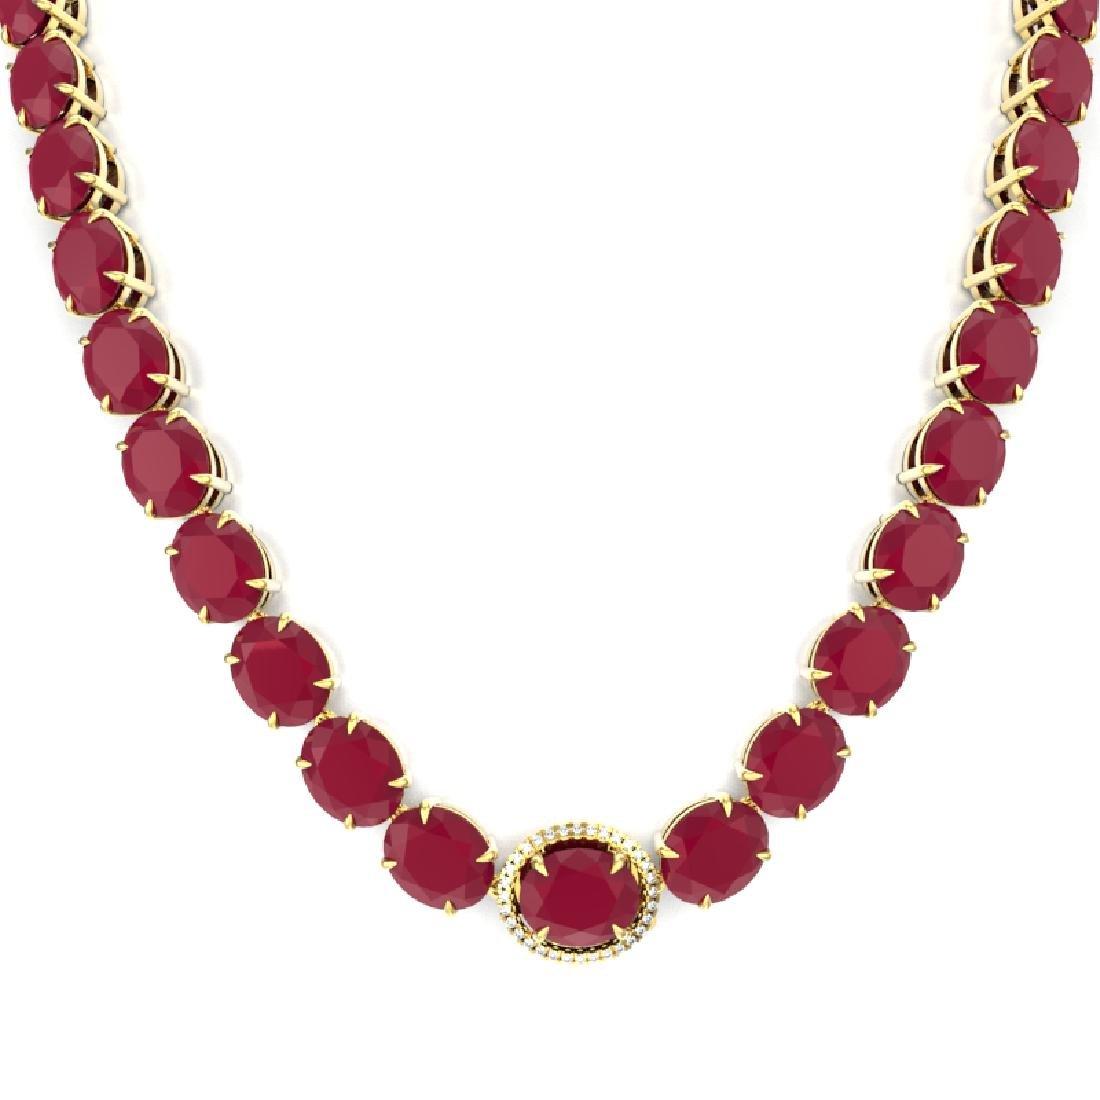 170 CTW Ruby & VS/SI Diamond Necklace 14K Yellow Gold - 2